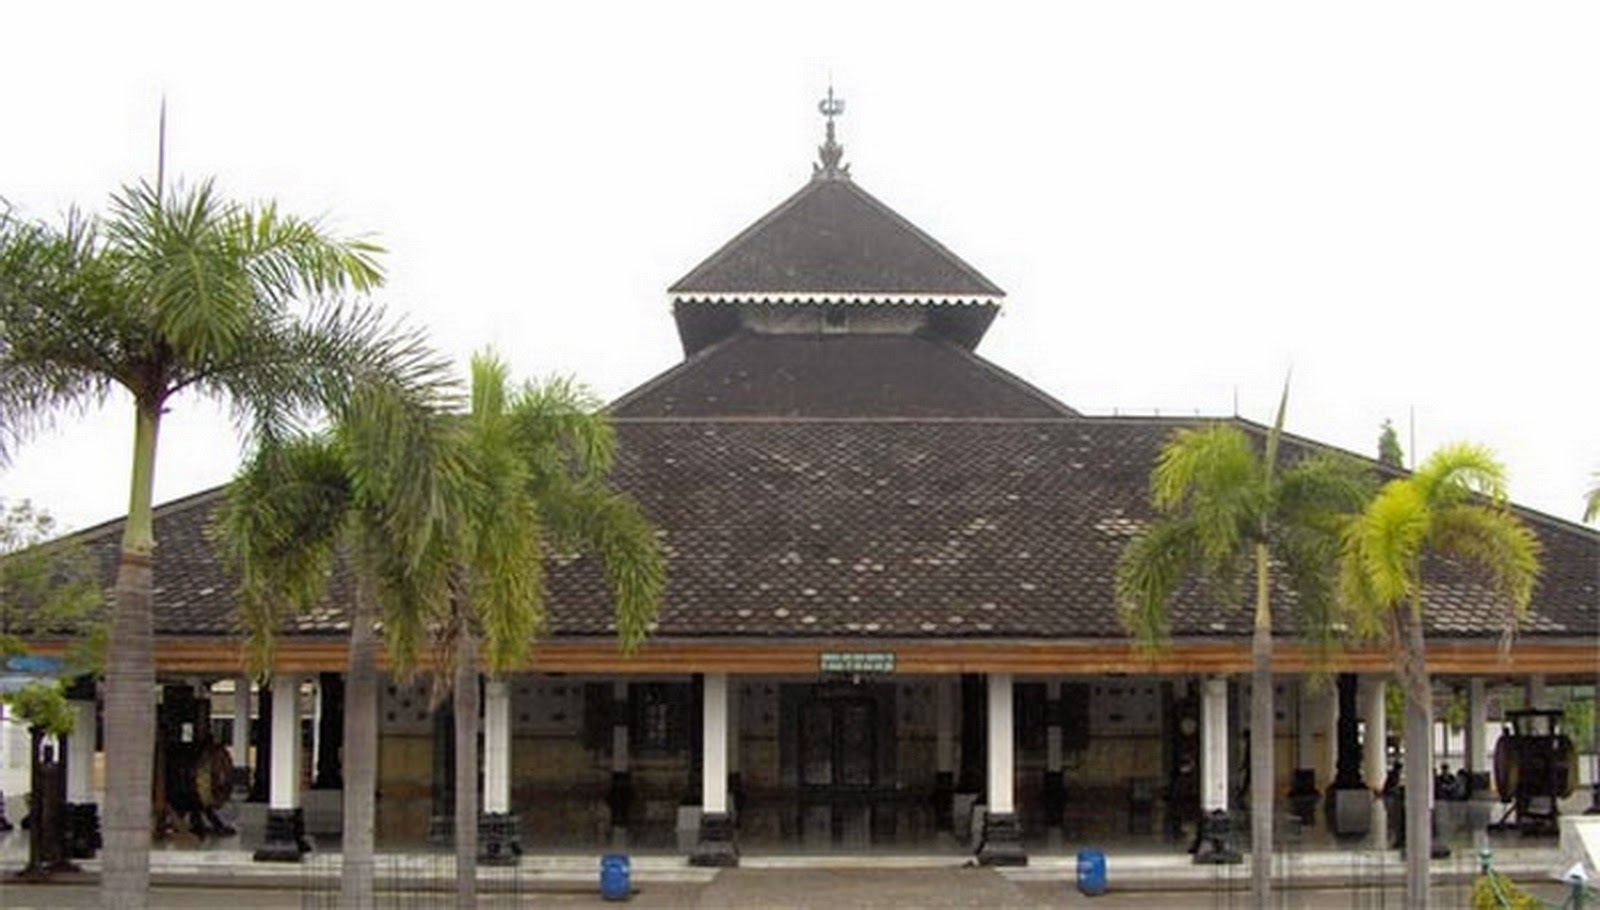 7 Masjid Tertua dan Paling Bersejarah di Indonesia